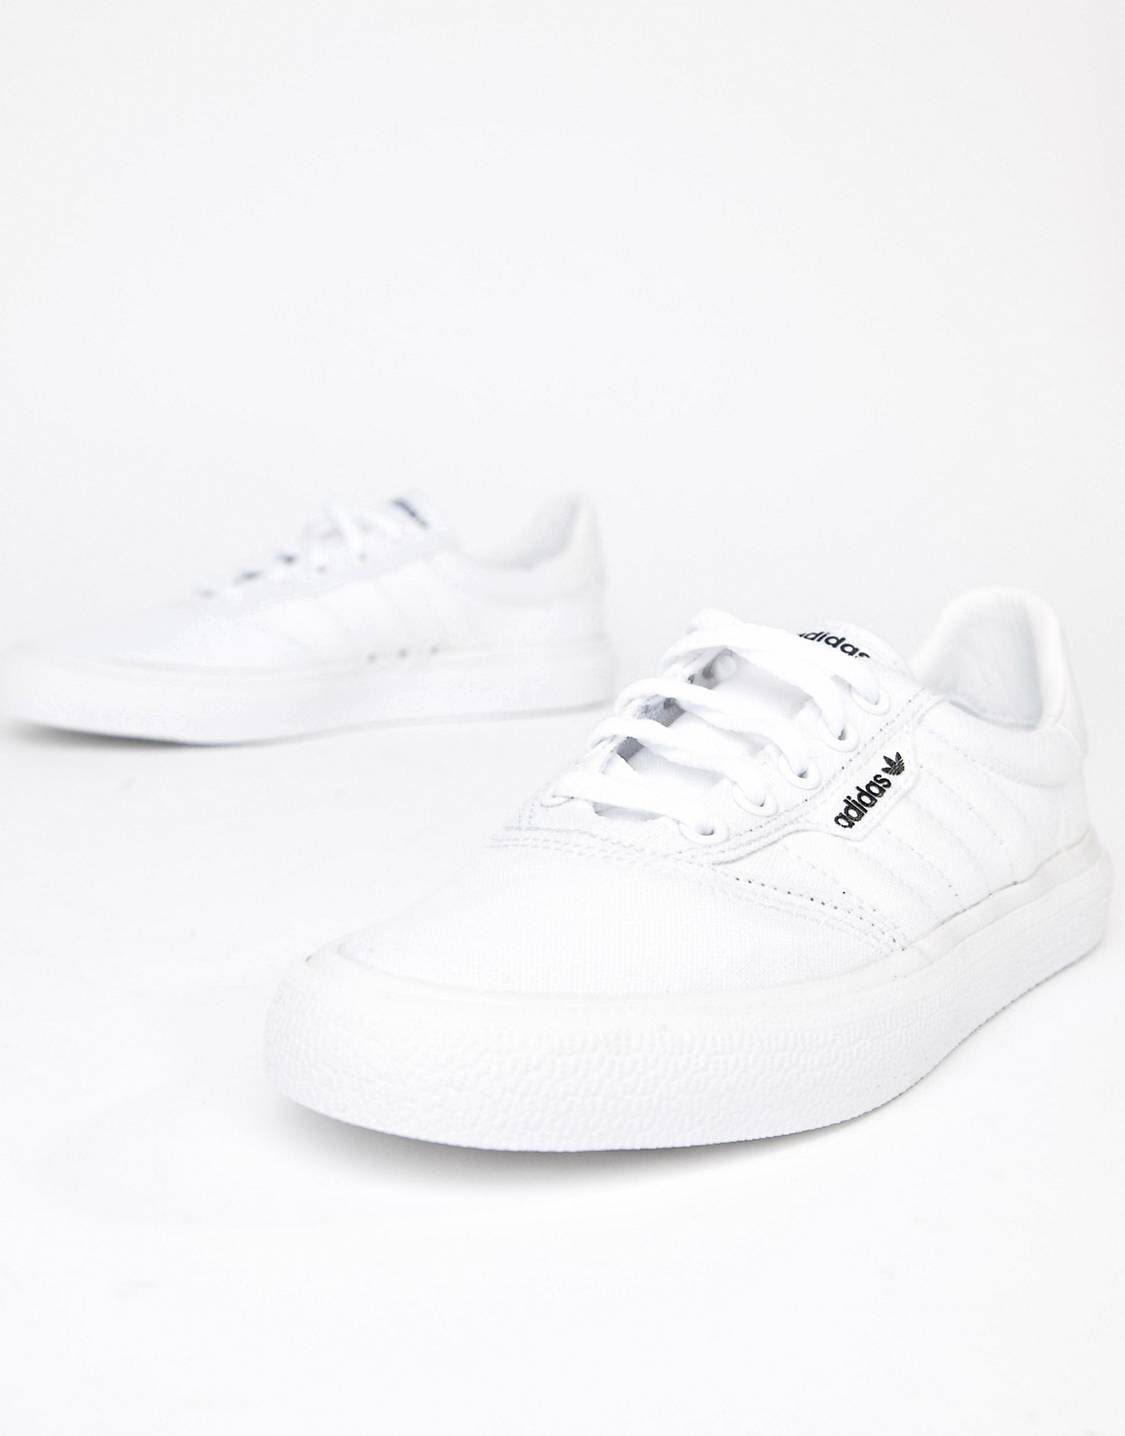 Vulc style Skateboarding 3MC in adidas whitemy sneaker w80PXnOk